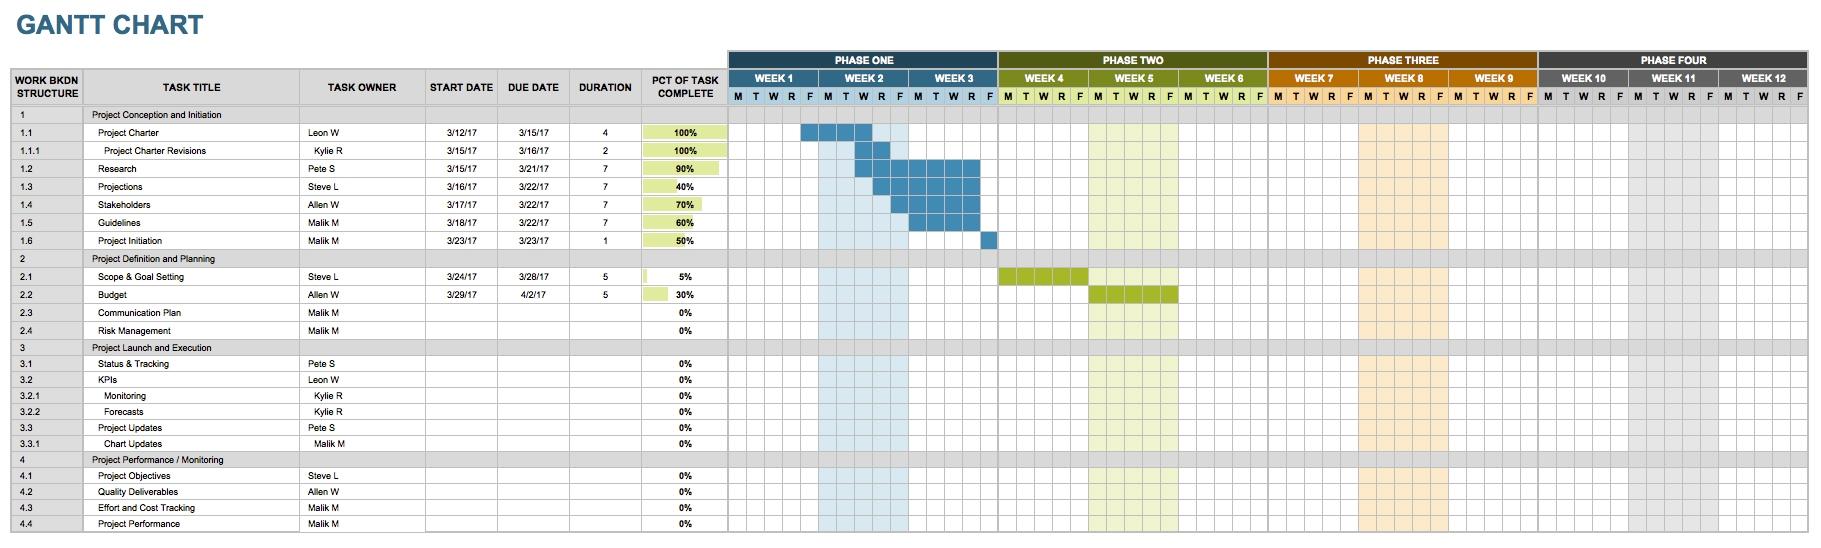 Free Marketing Timeline Tips And Templates Smartsheet 89uj